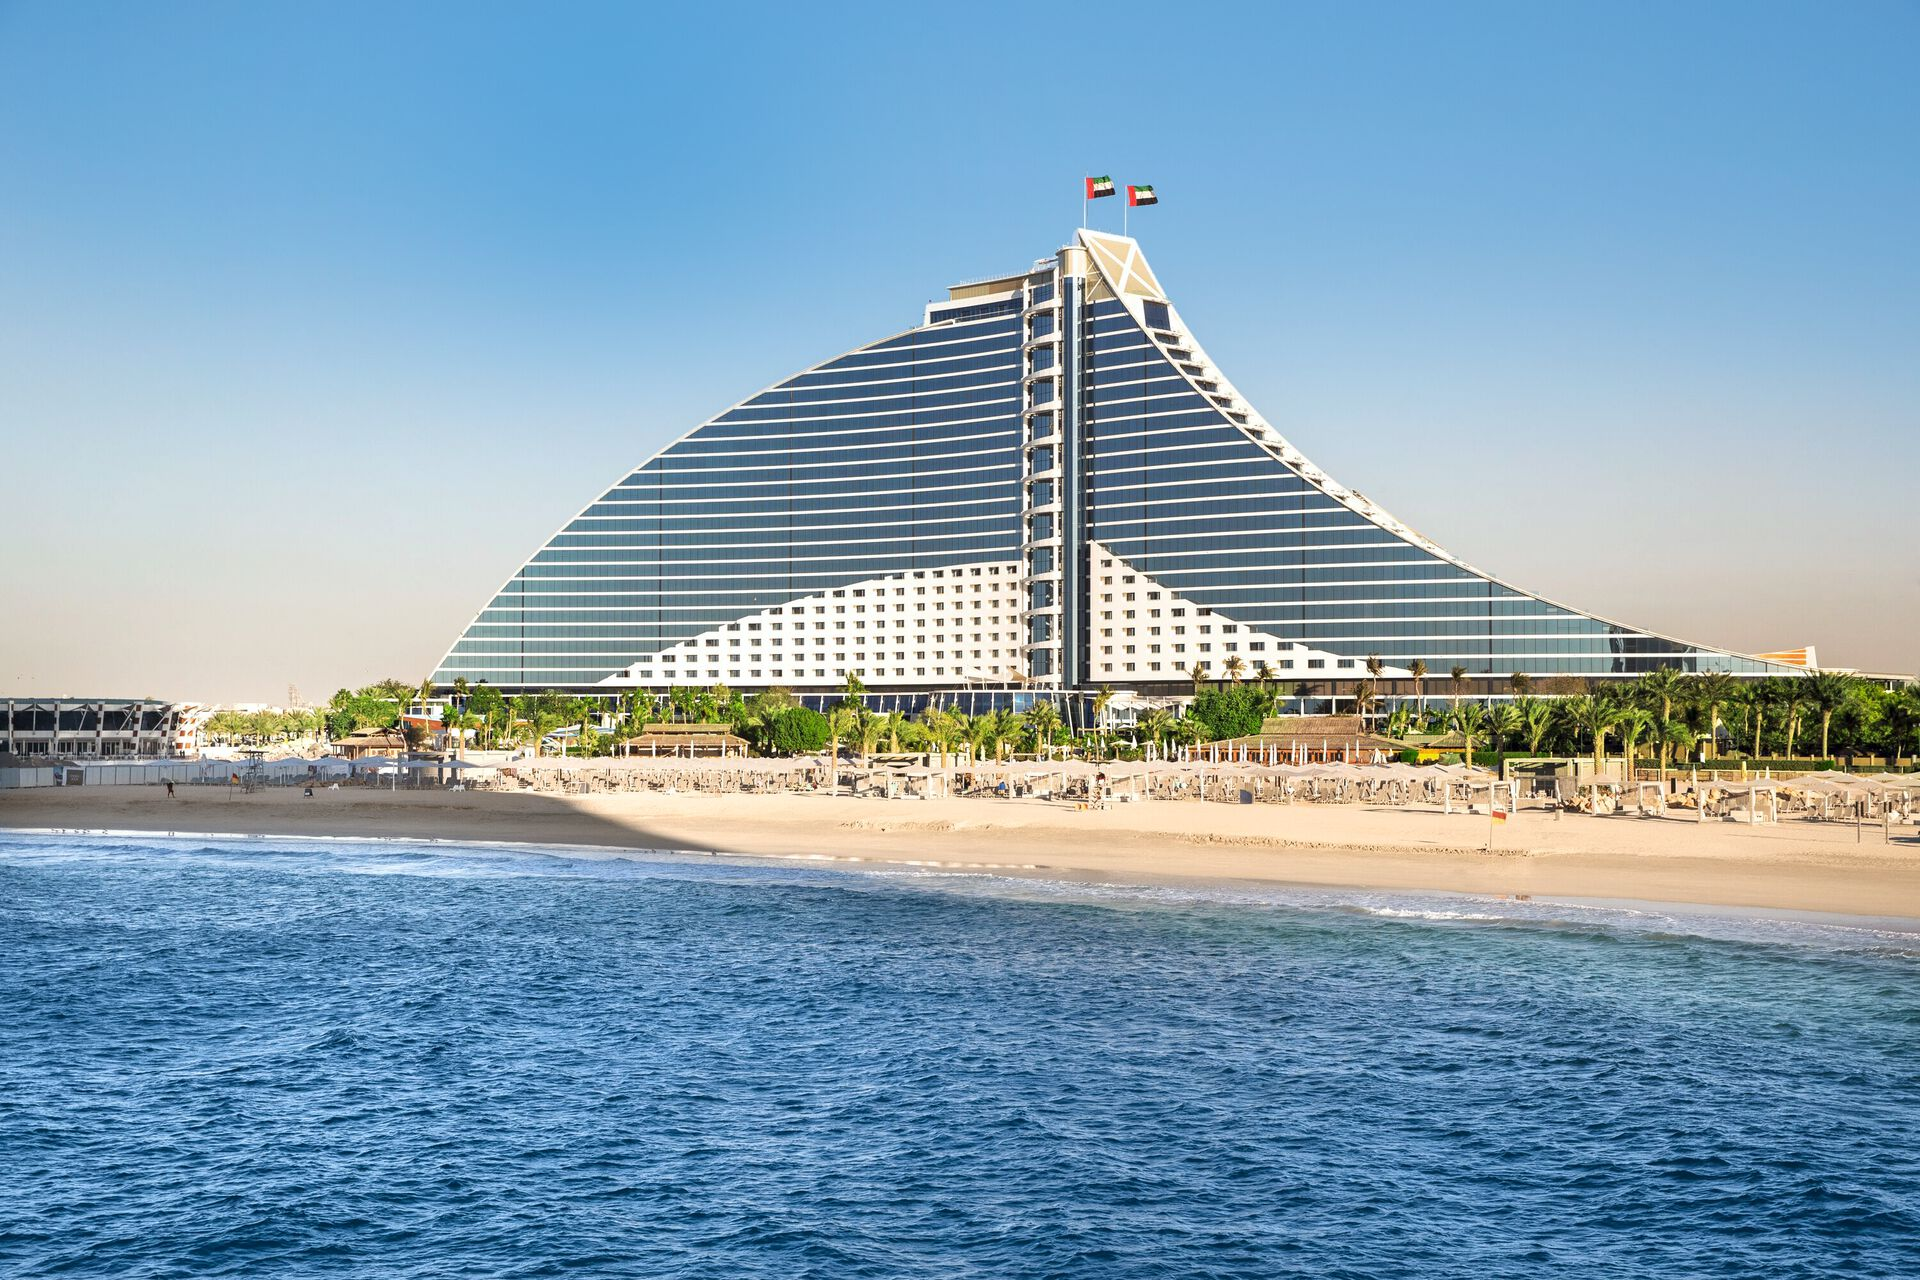 Séjour Emirats Arabes Unis - Jumeirah Beach Hotel - 5*